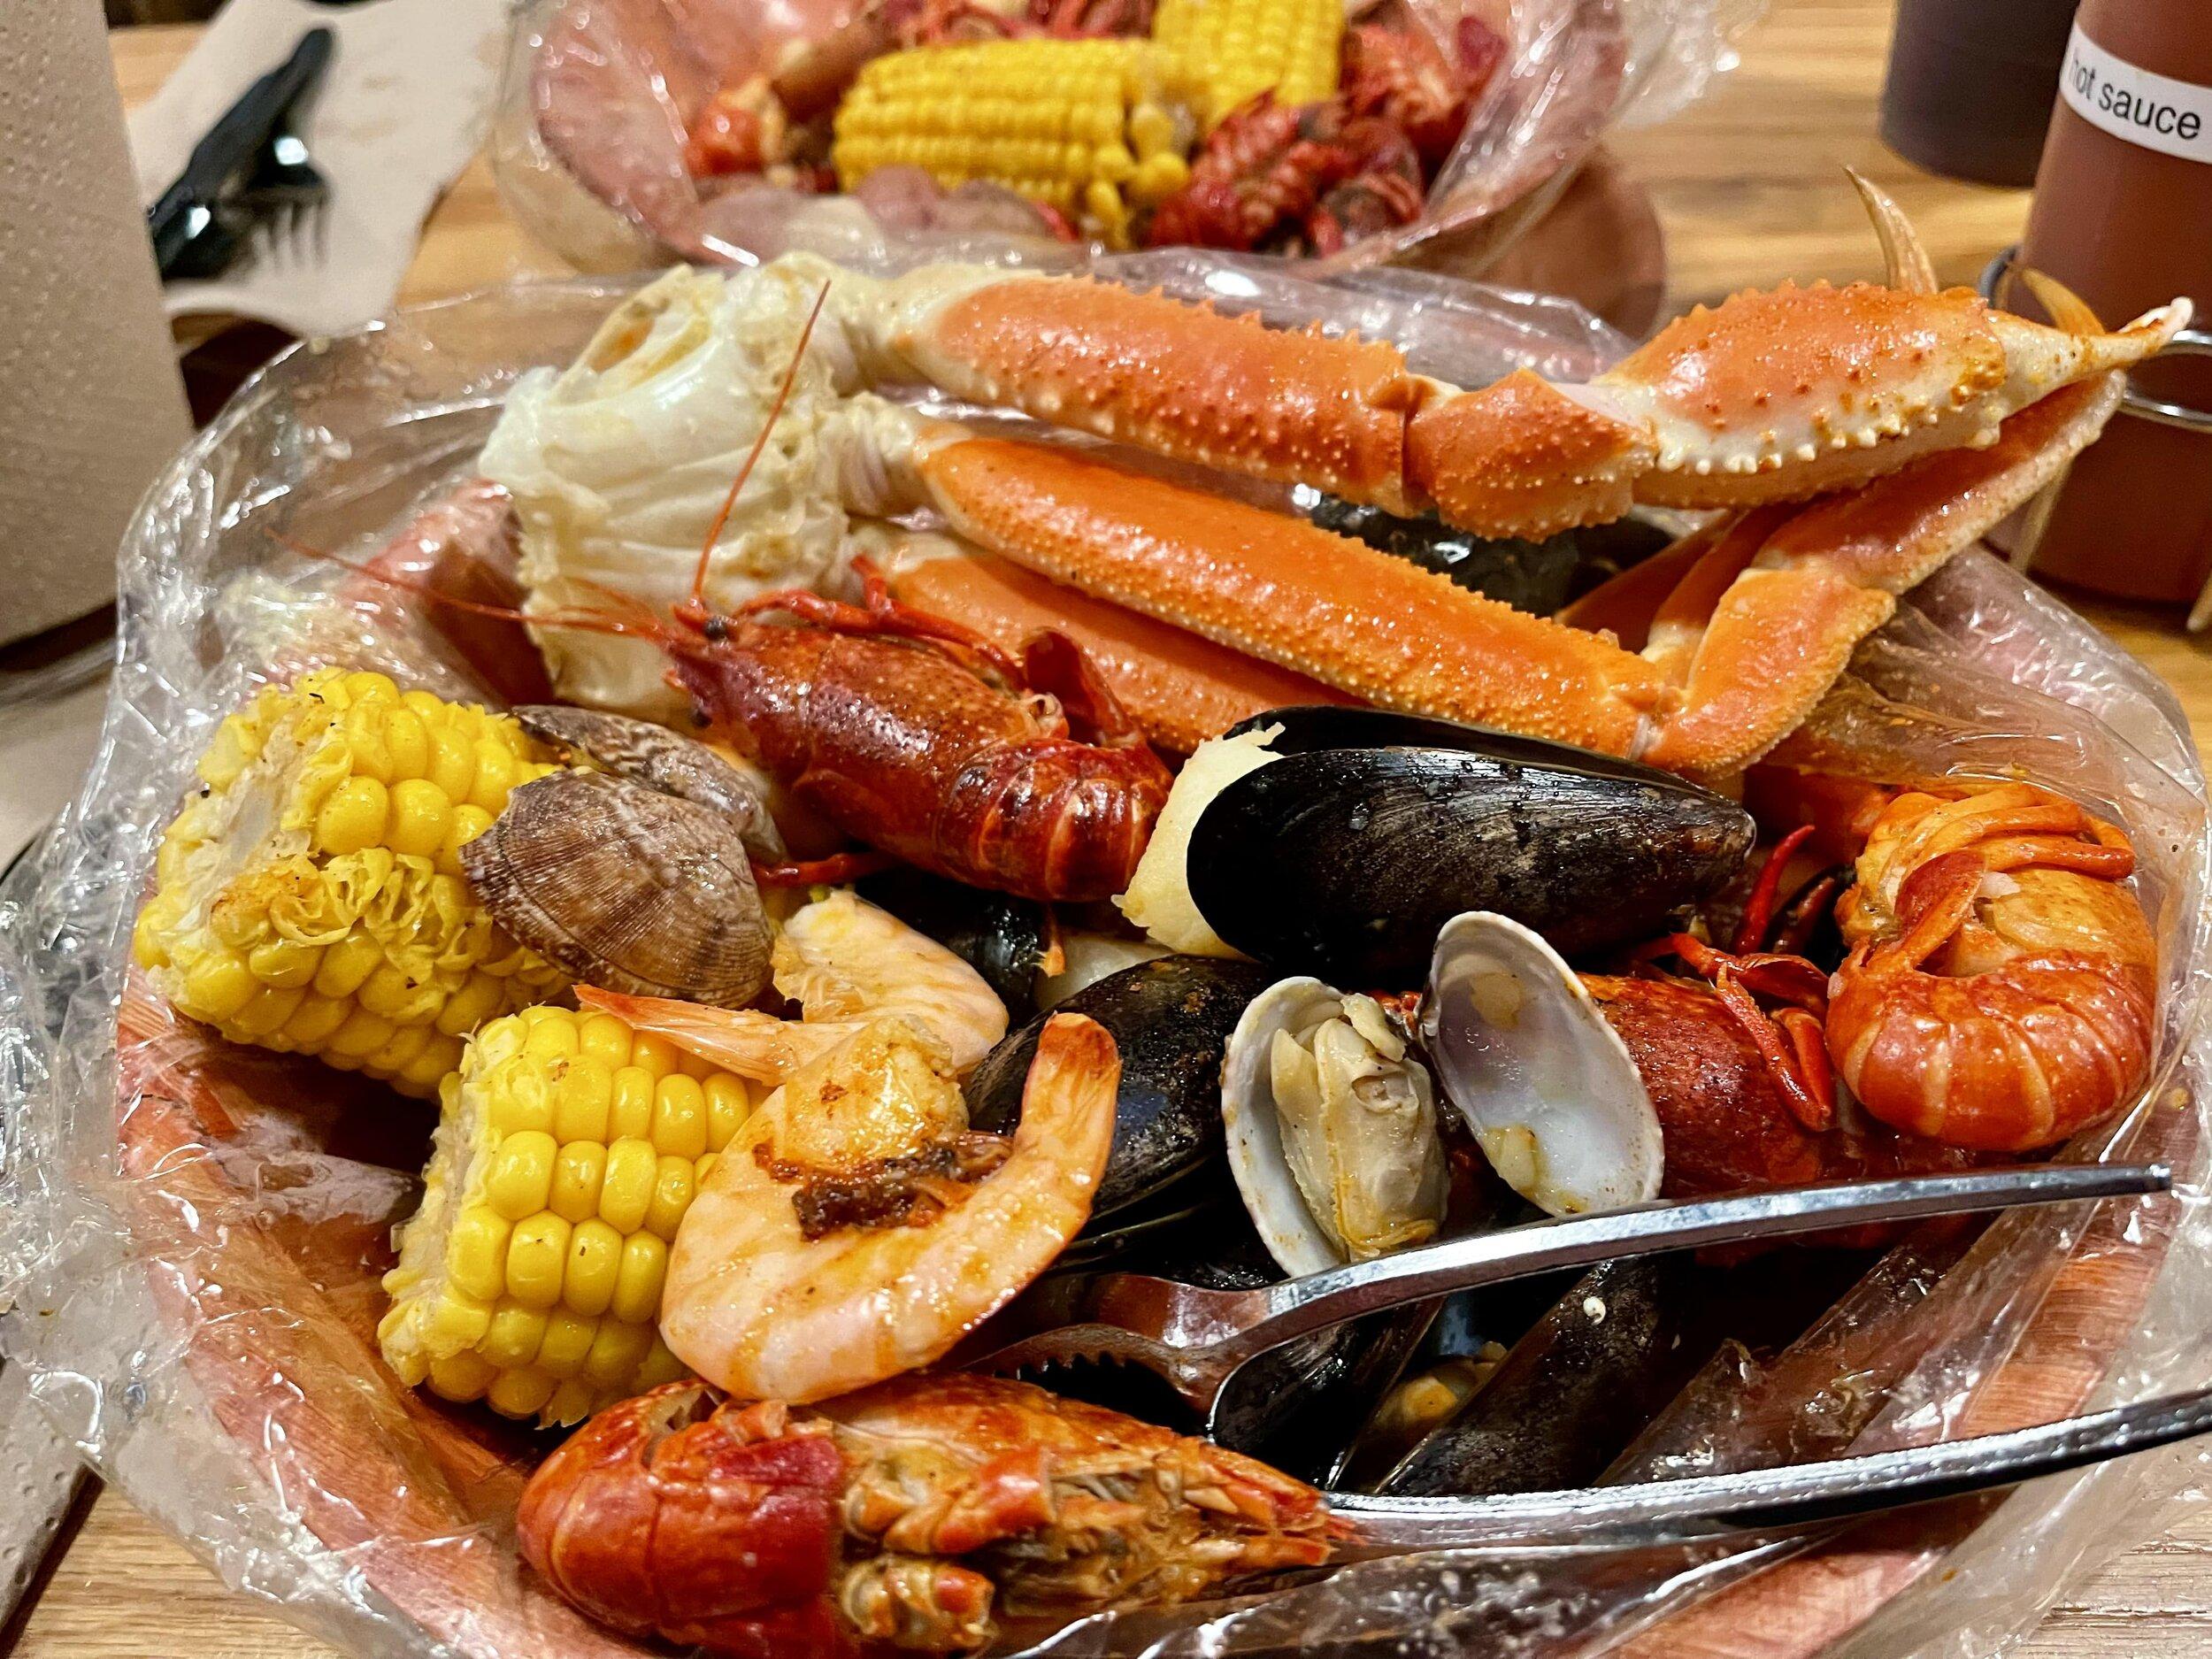 Lunch at the Savannah Seafood Shack